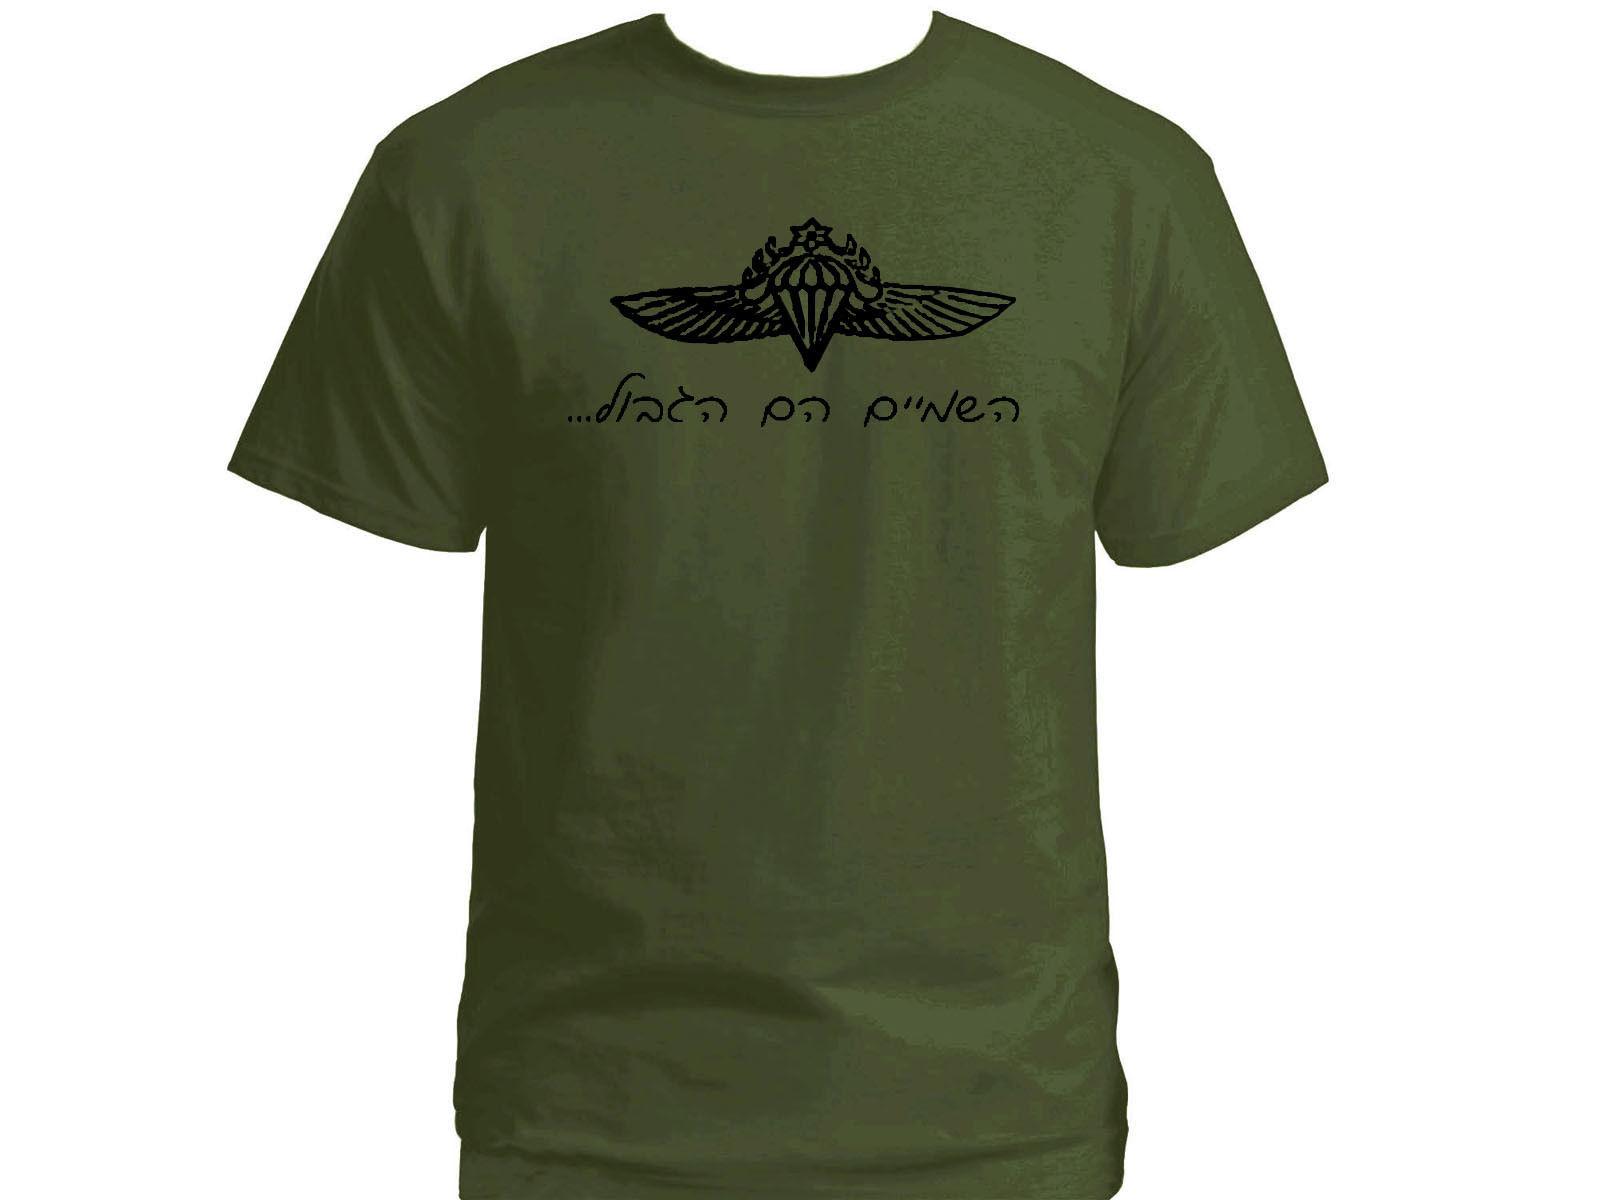 Zahal Israeli Paratrooper Flying Serpent Ball Cap